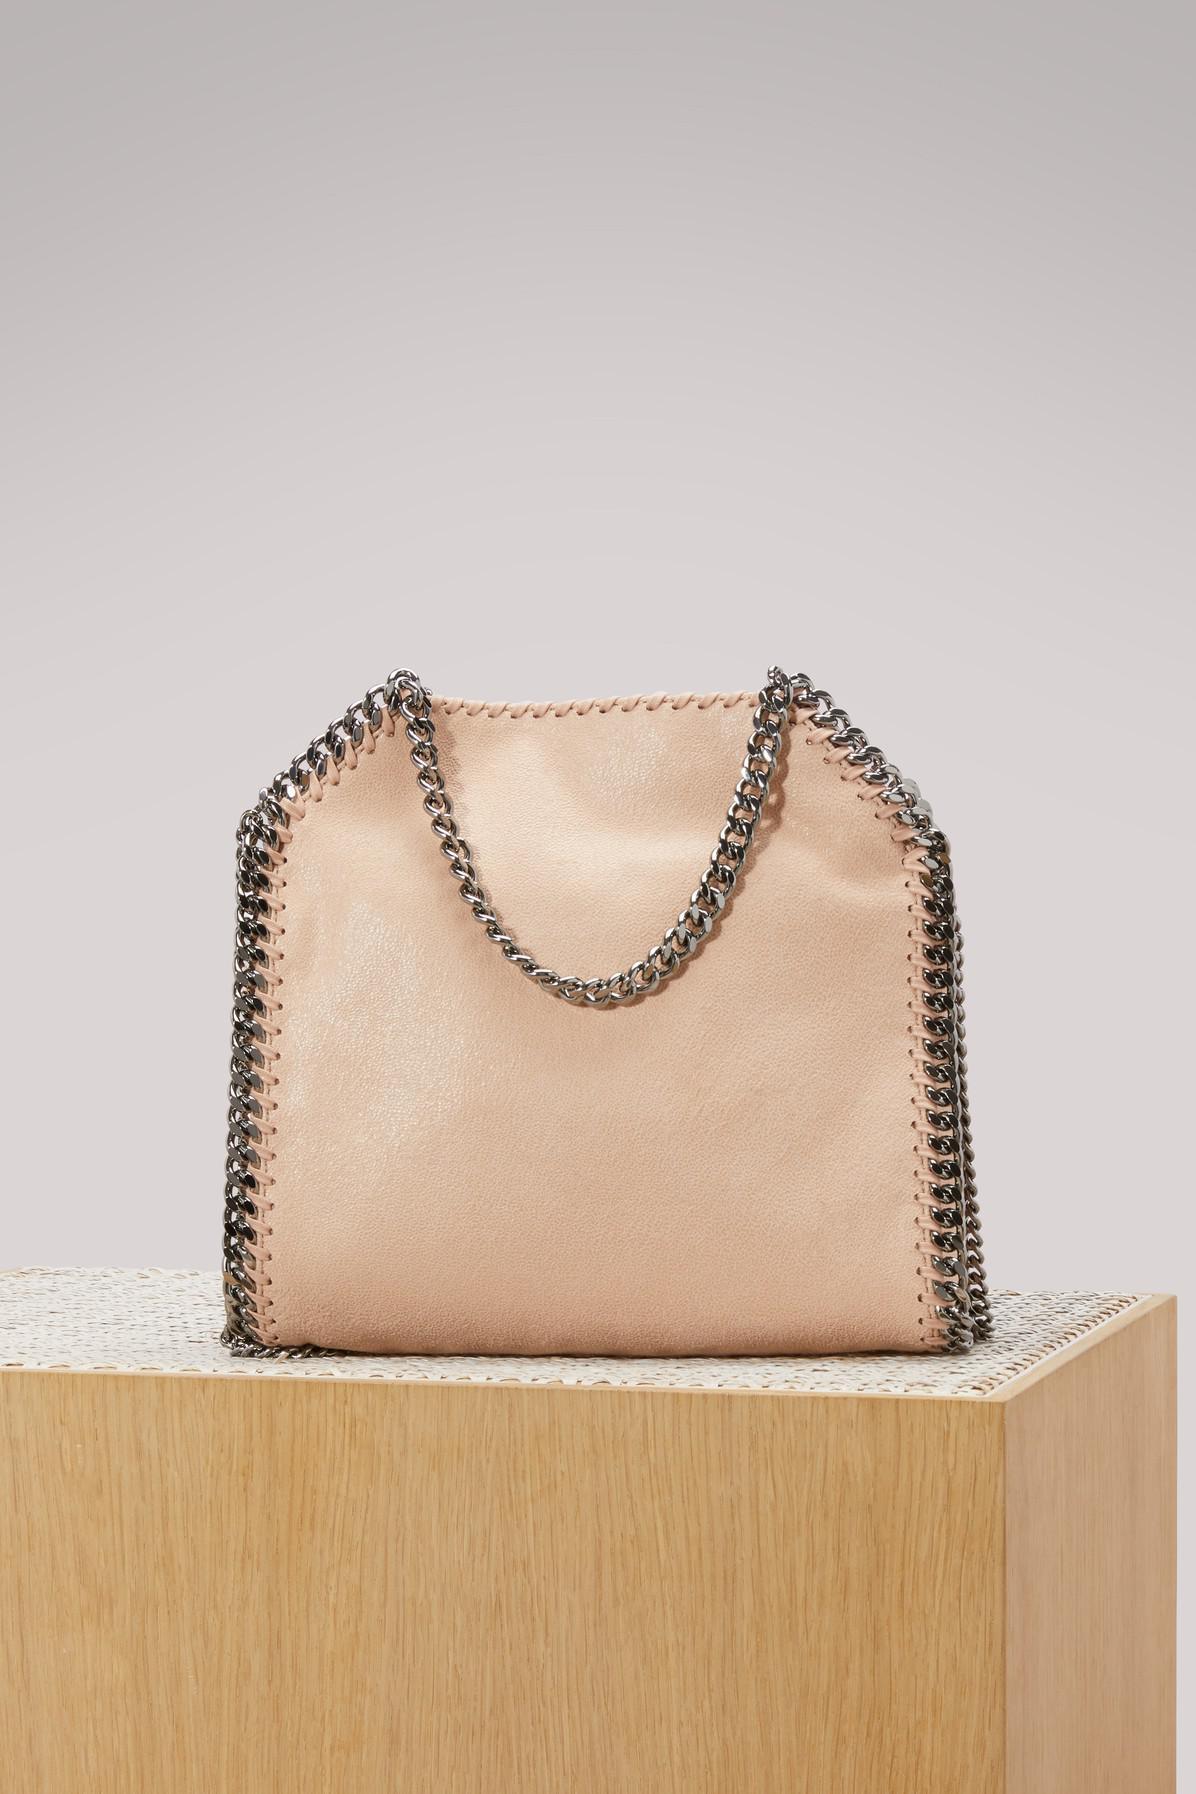 1083f720a0e ... low priced f5634 1e06f Stella McCartney - Natural Falabella Shaggy Deer  Mini Tote Bag - Lyst ...